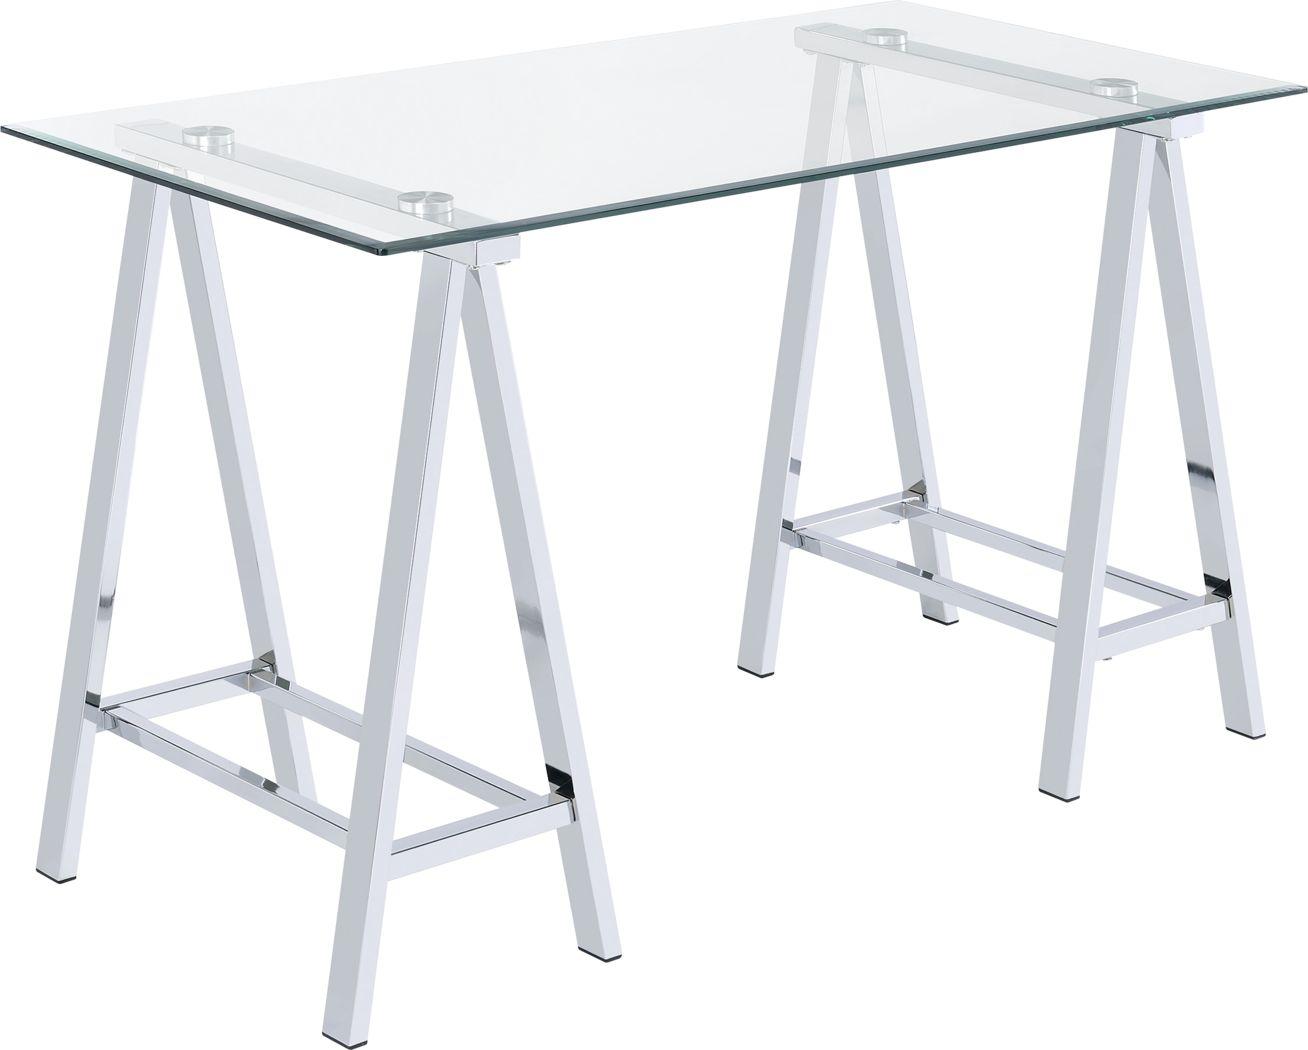 Lymenta Gray Desk